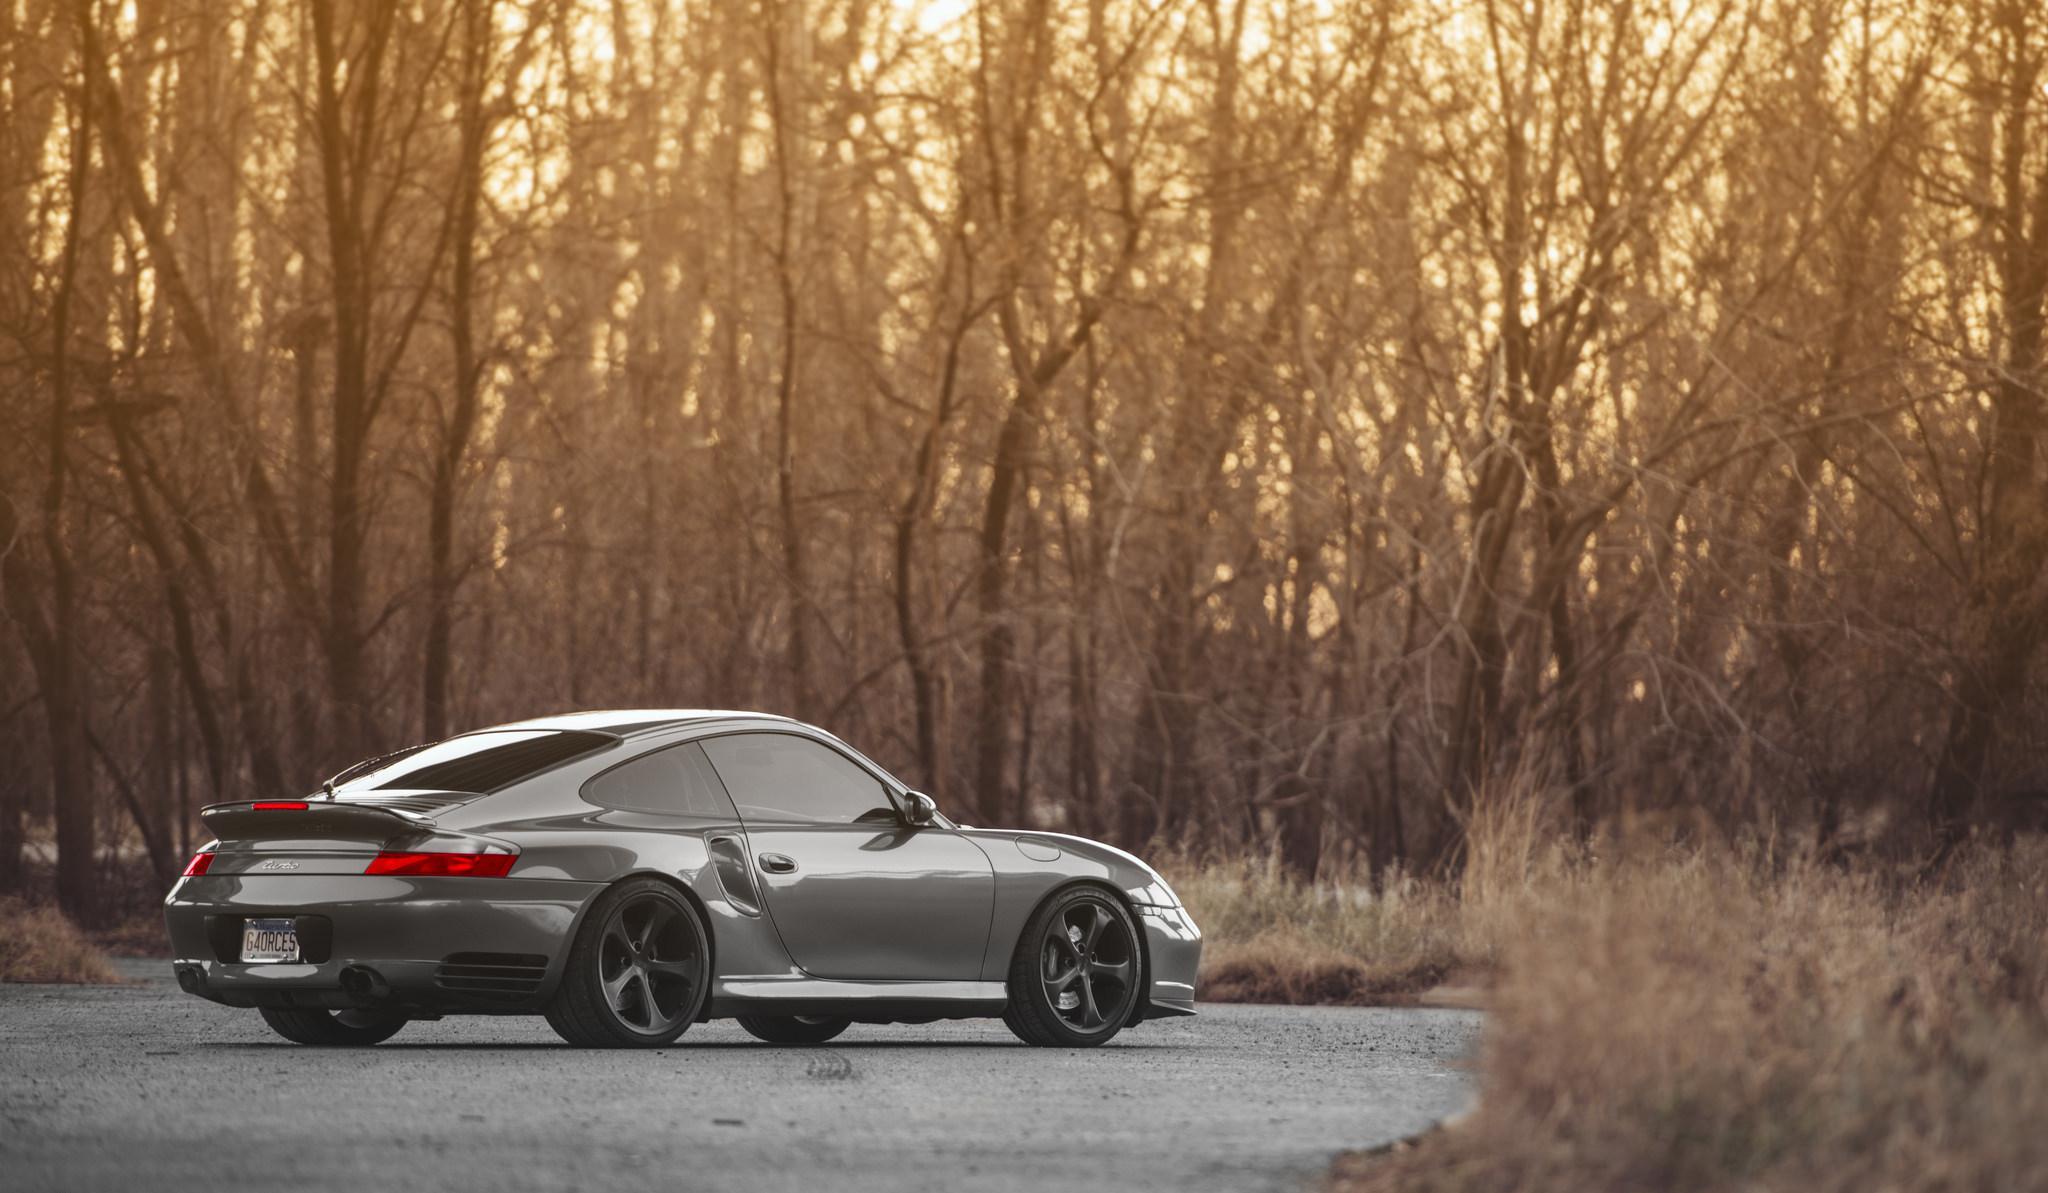 Porsche 911 Wallpapers HD Download 2048x1193